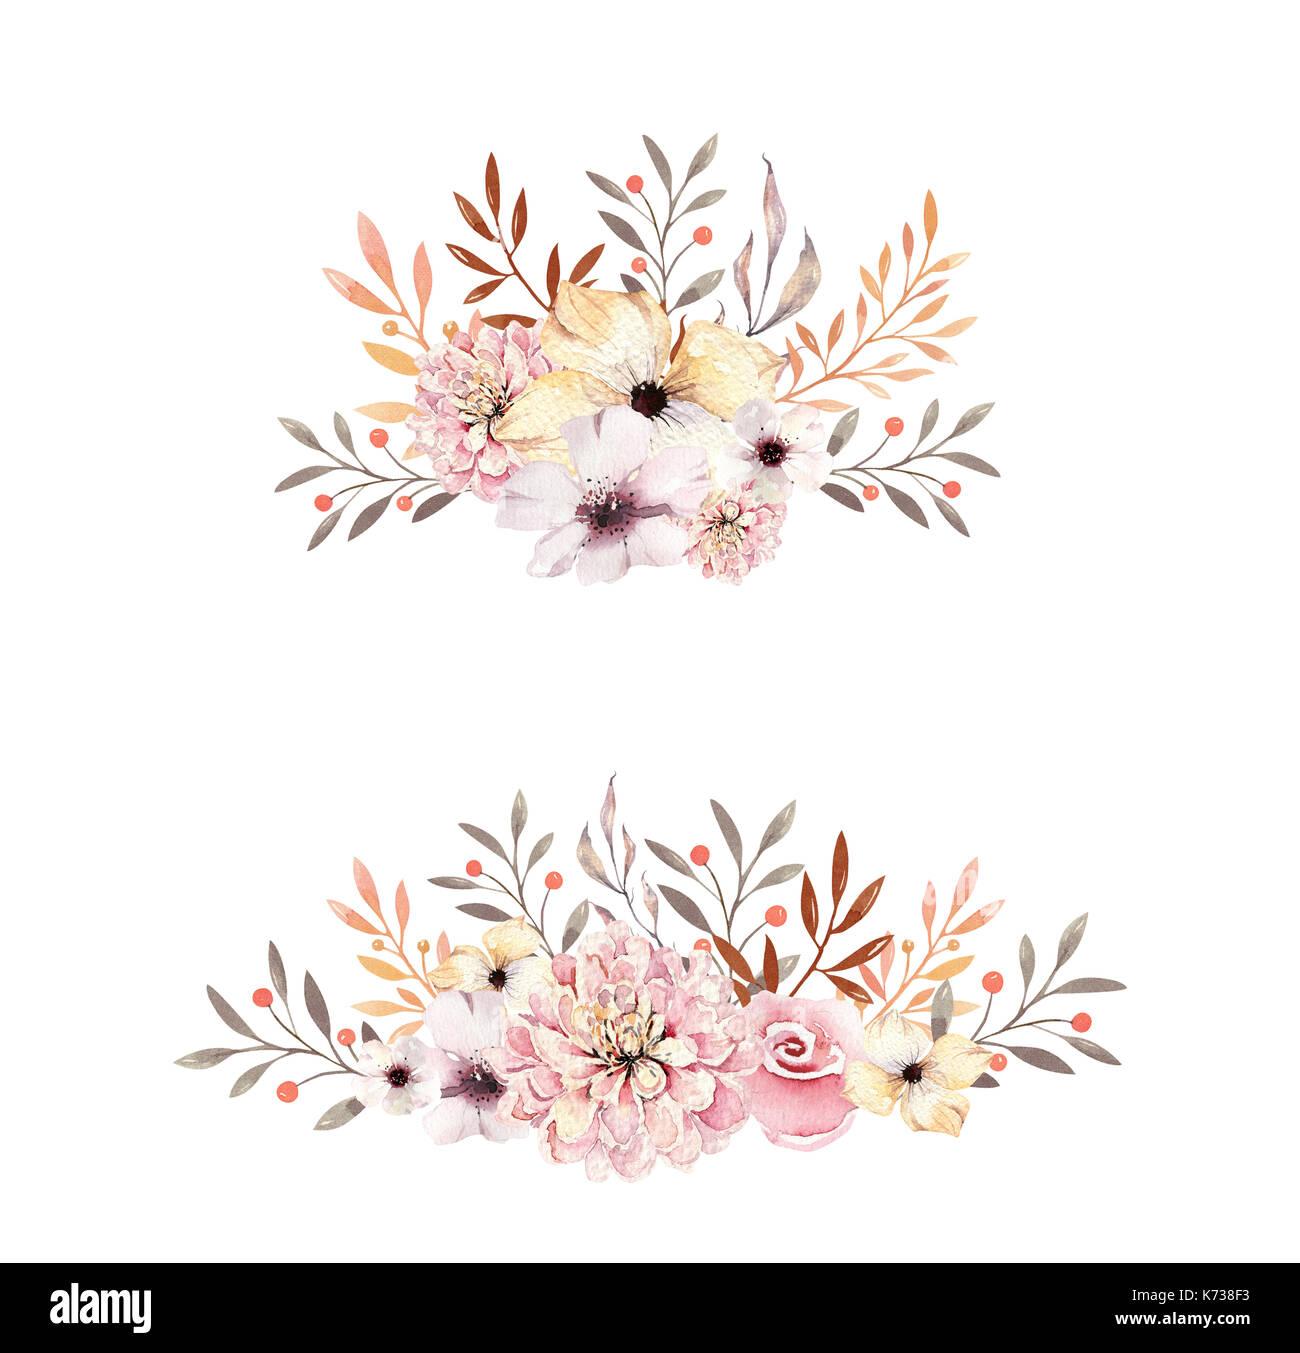 Autumn Falling Leaves Live Wallpaper Set Of Watercolor Boho Floral Bouquets Watercolour